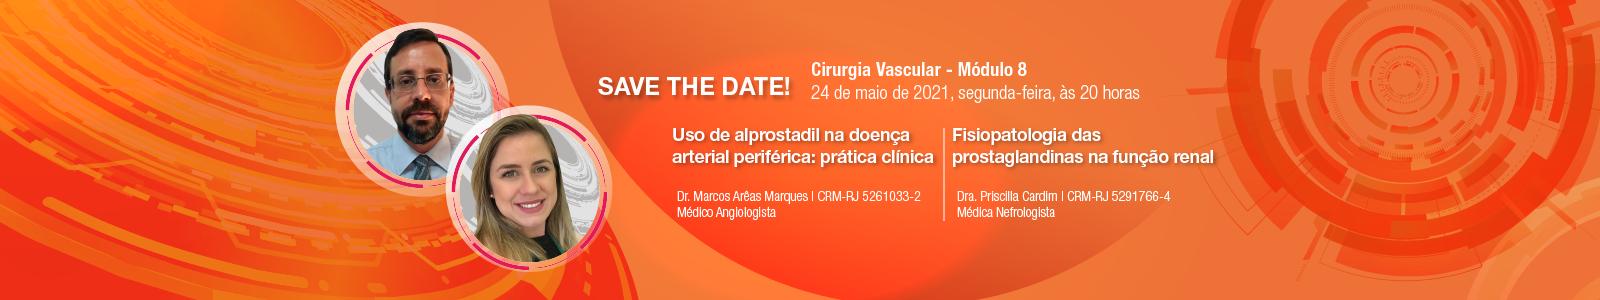 Visão Aché2021-banners vascular-1 1 cópia